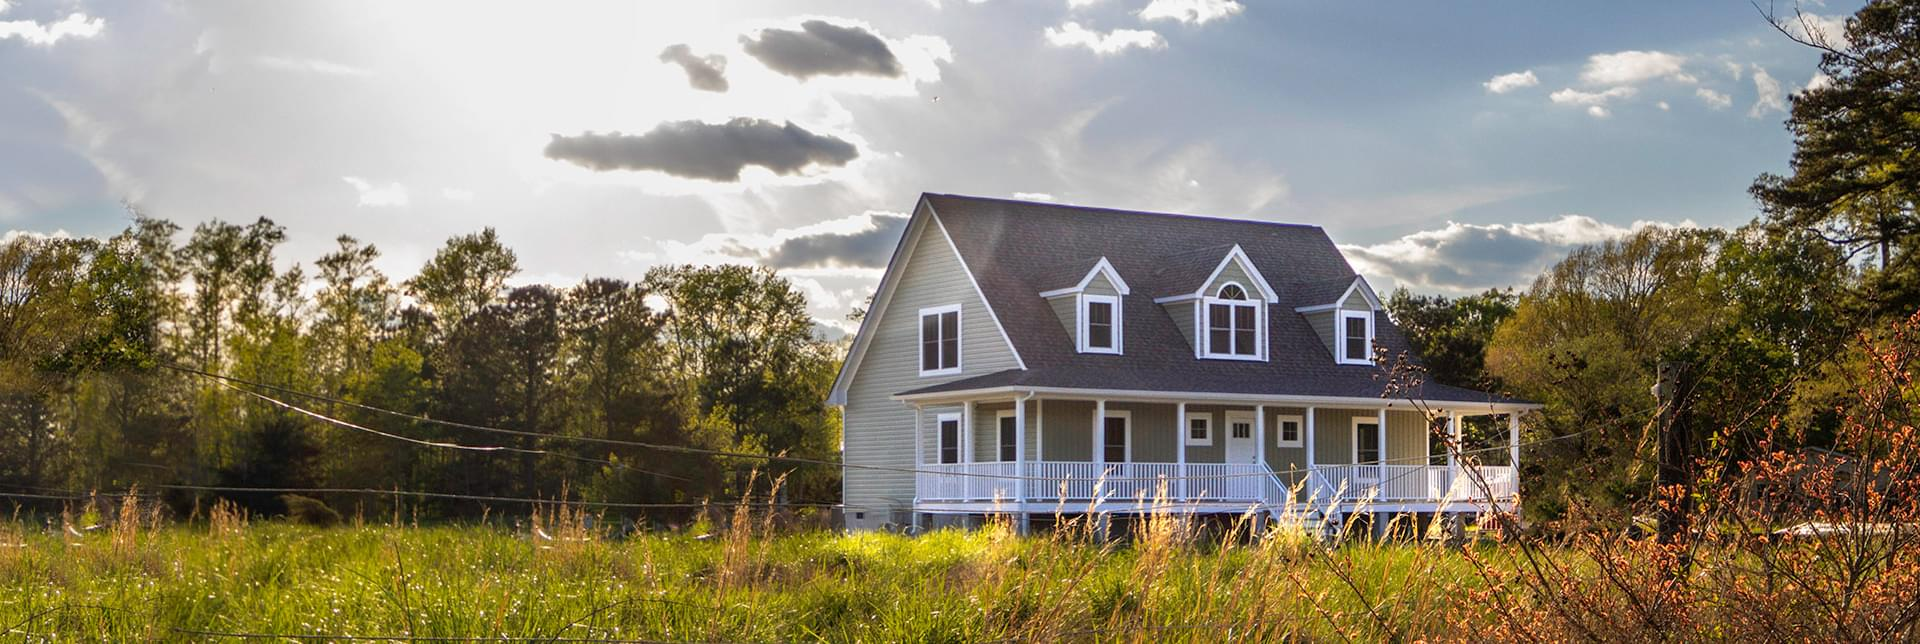 New Homes in Virginia Beach VA